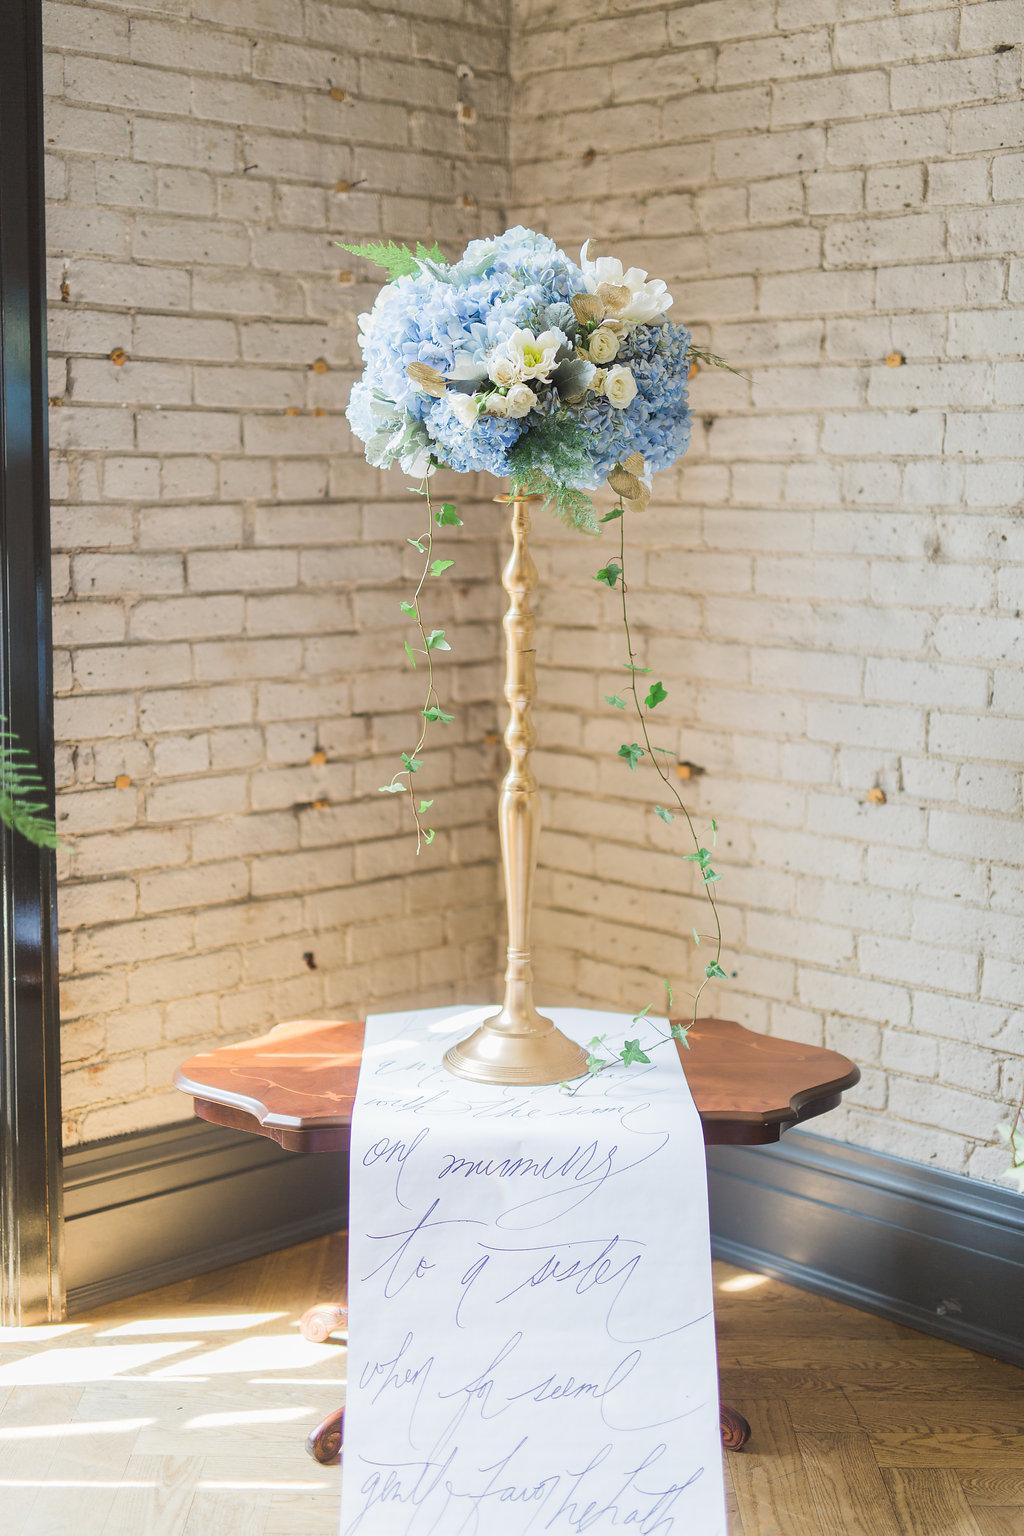 Phoebe Lo Events Toronto Wedding - Storys Building Urban Loft Paper Inspired Wedding 013.jpg